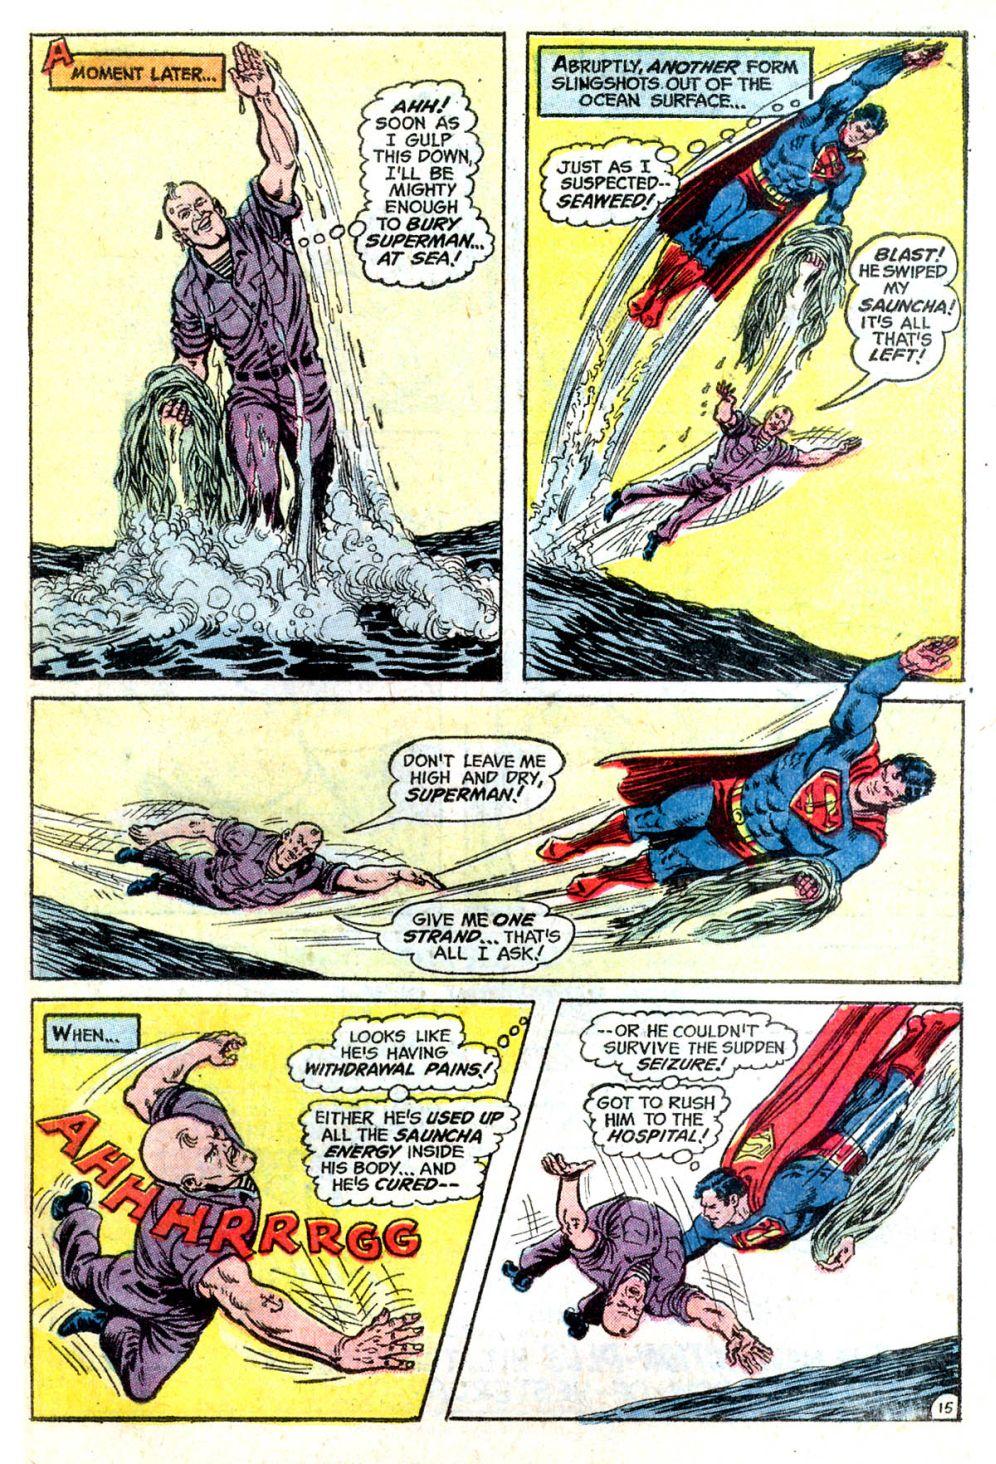 Action Comics (1938) 421 Page 18